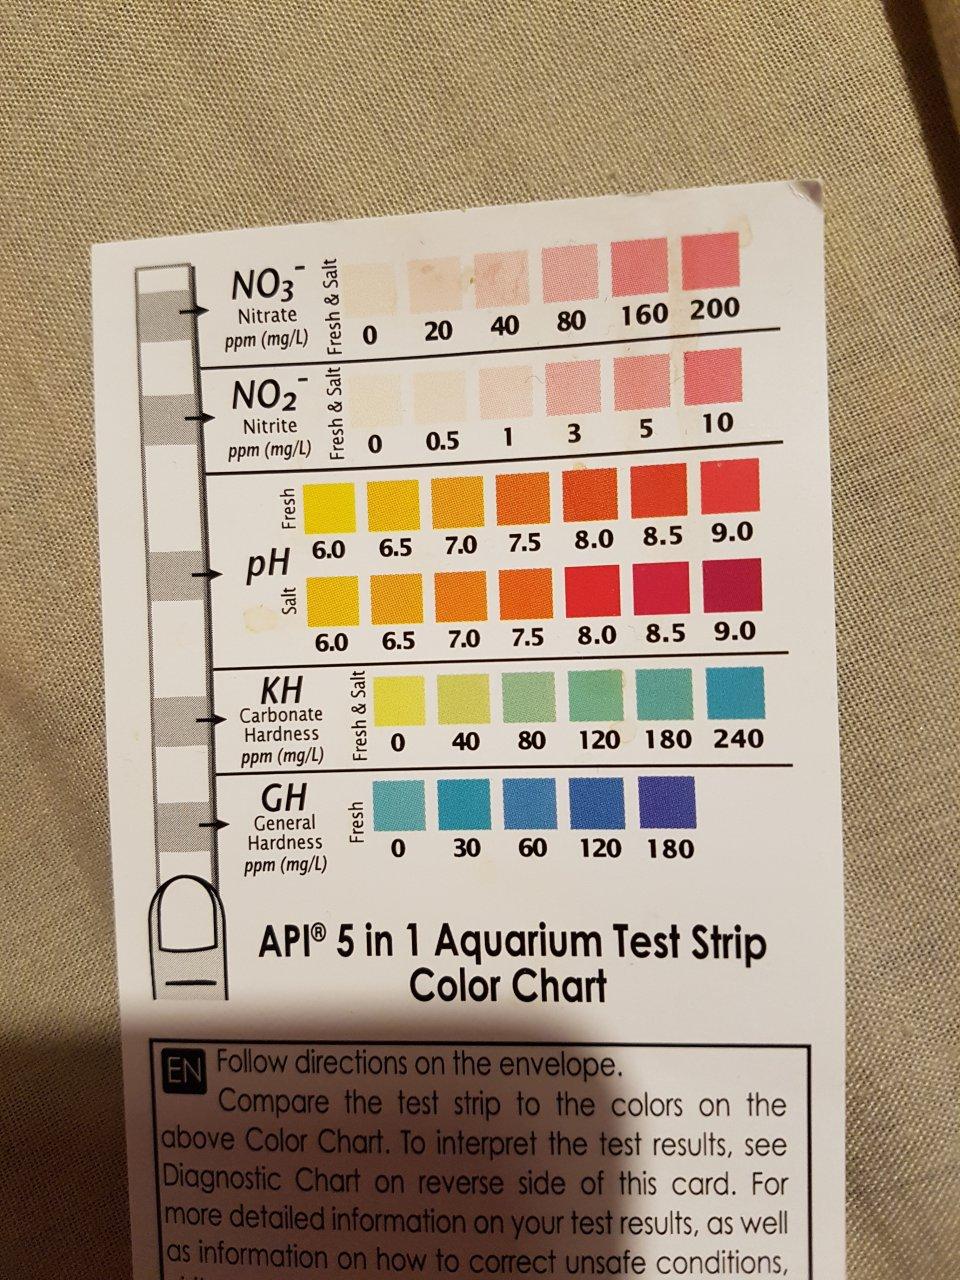 Wa2 safe guide swim test